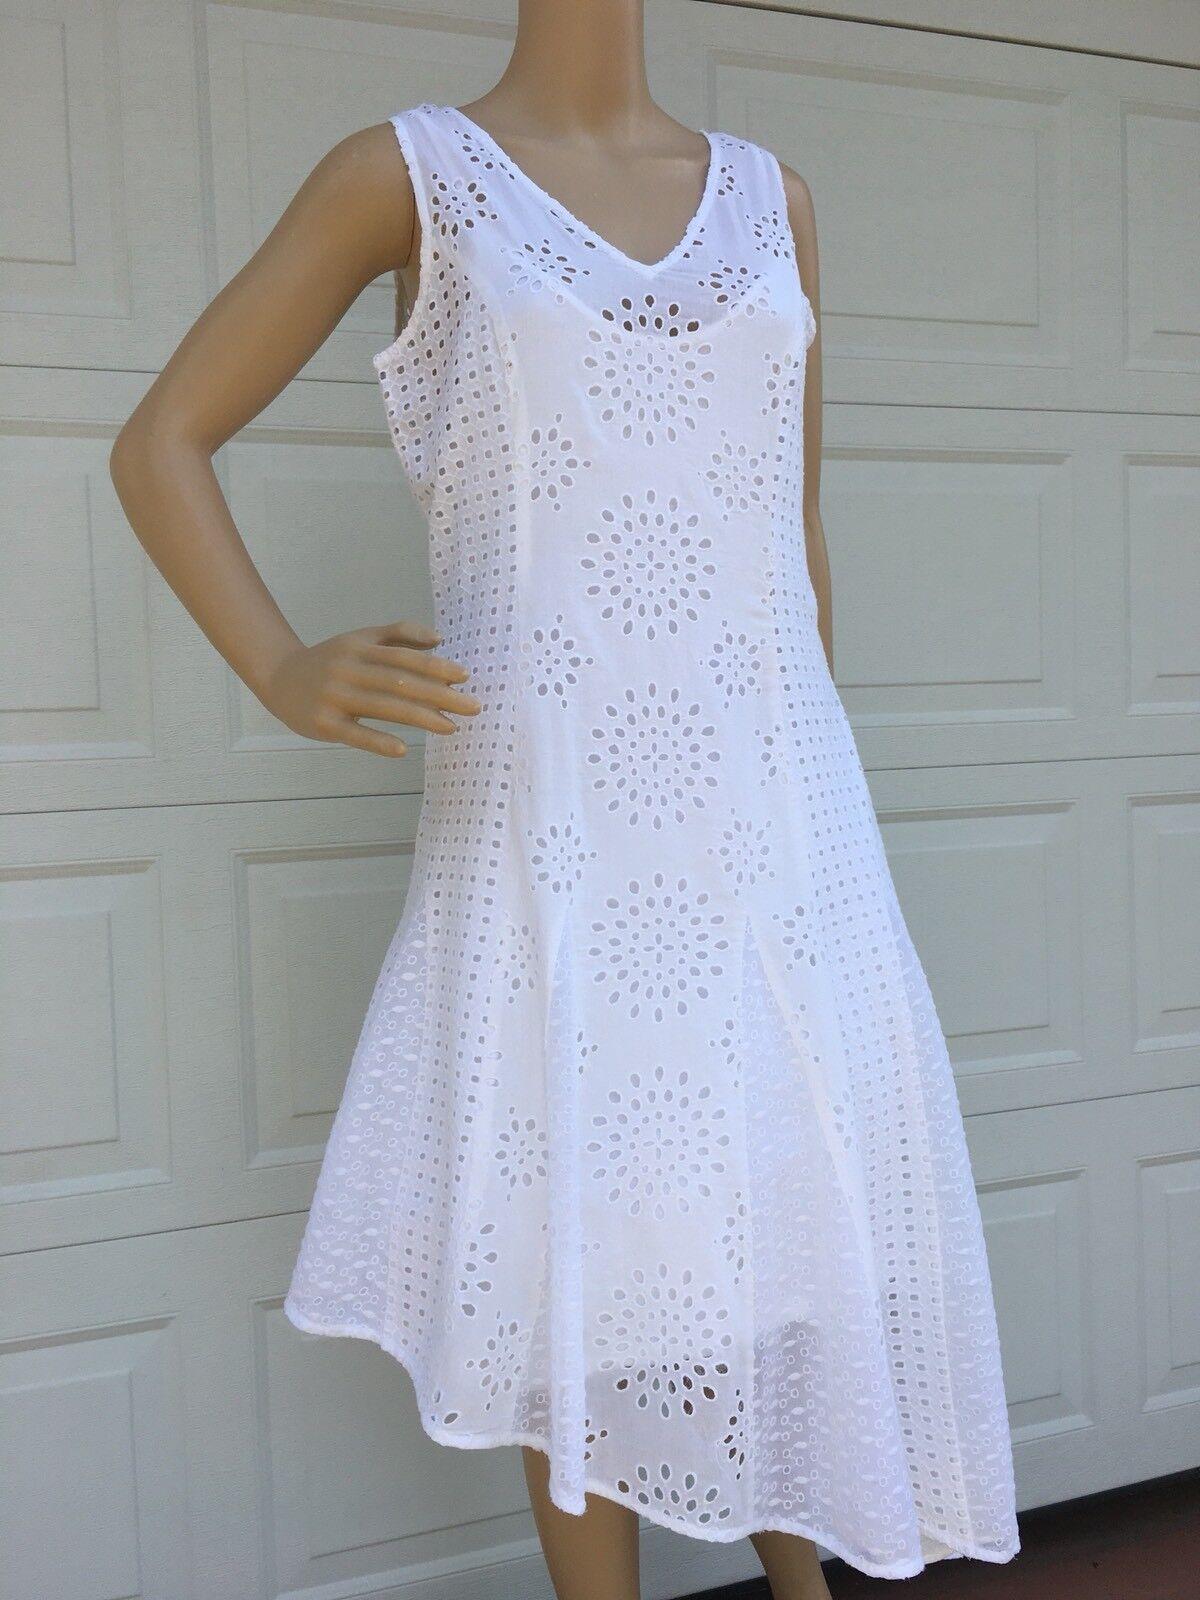 premium selection 09336 8c60d ... NEW SUNDANCE CATALOG White White White Cotton Eyelet Lace Asymmetric  Dress 6 8 10 12 0bb6d4 ...